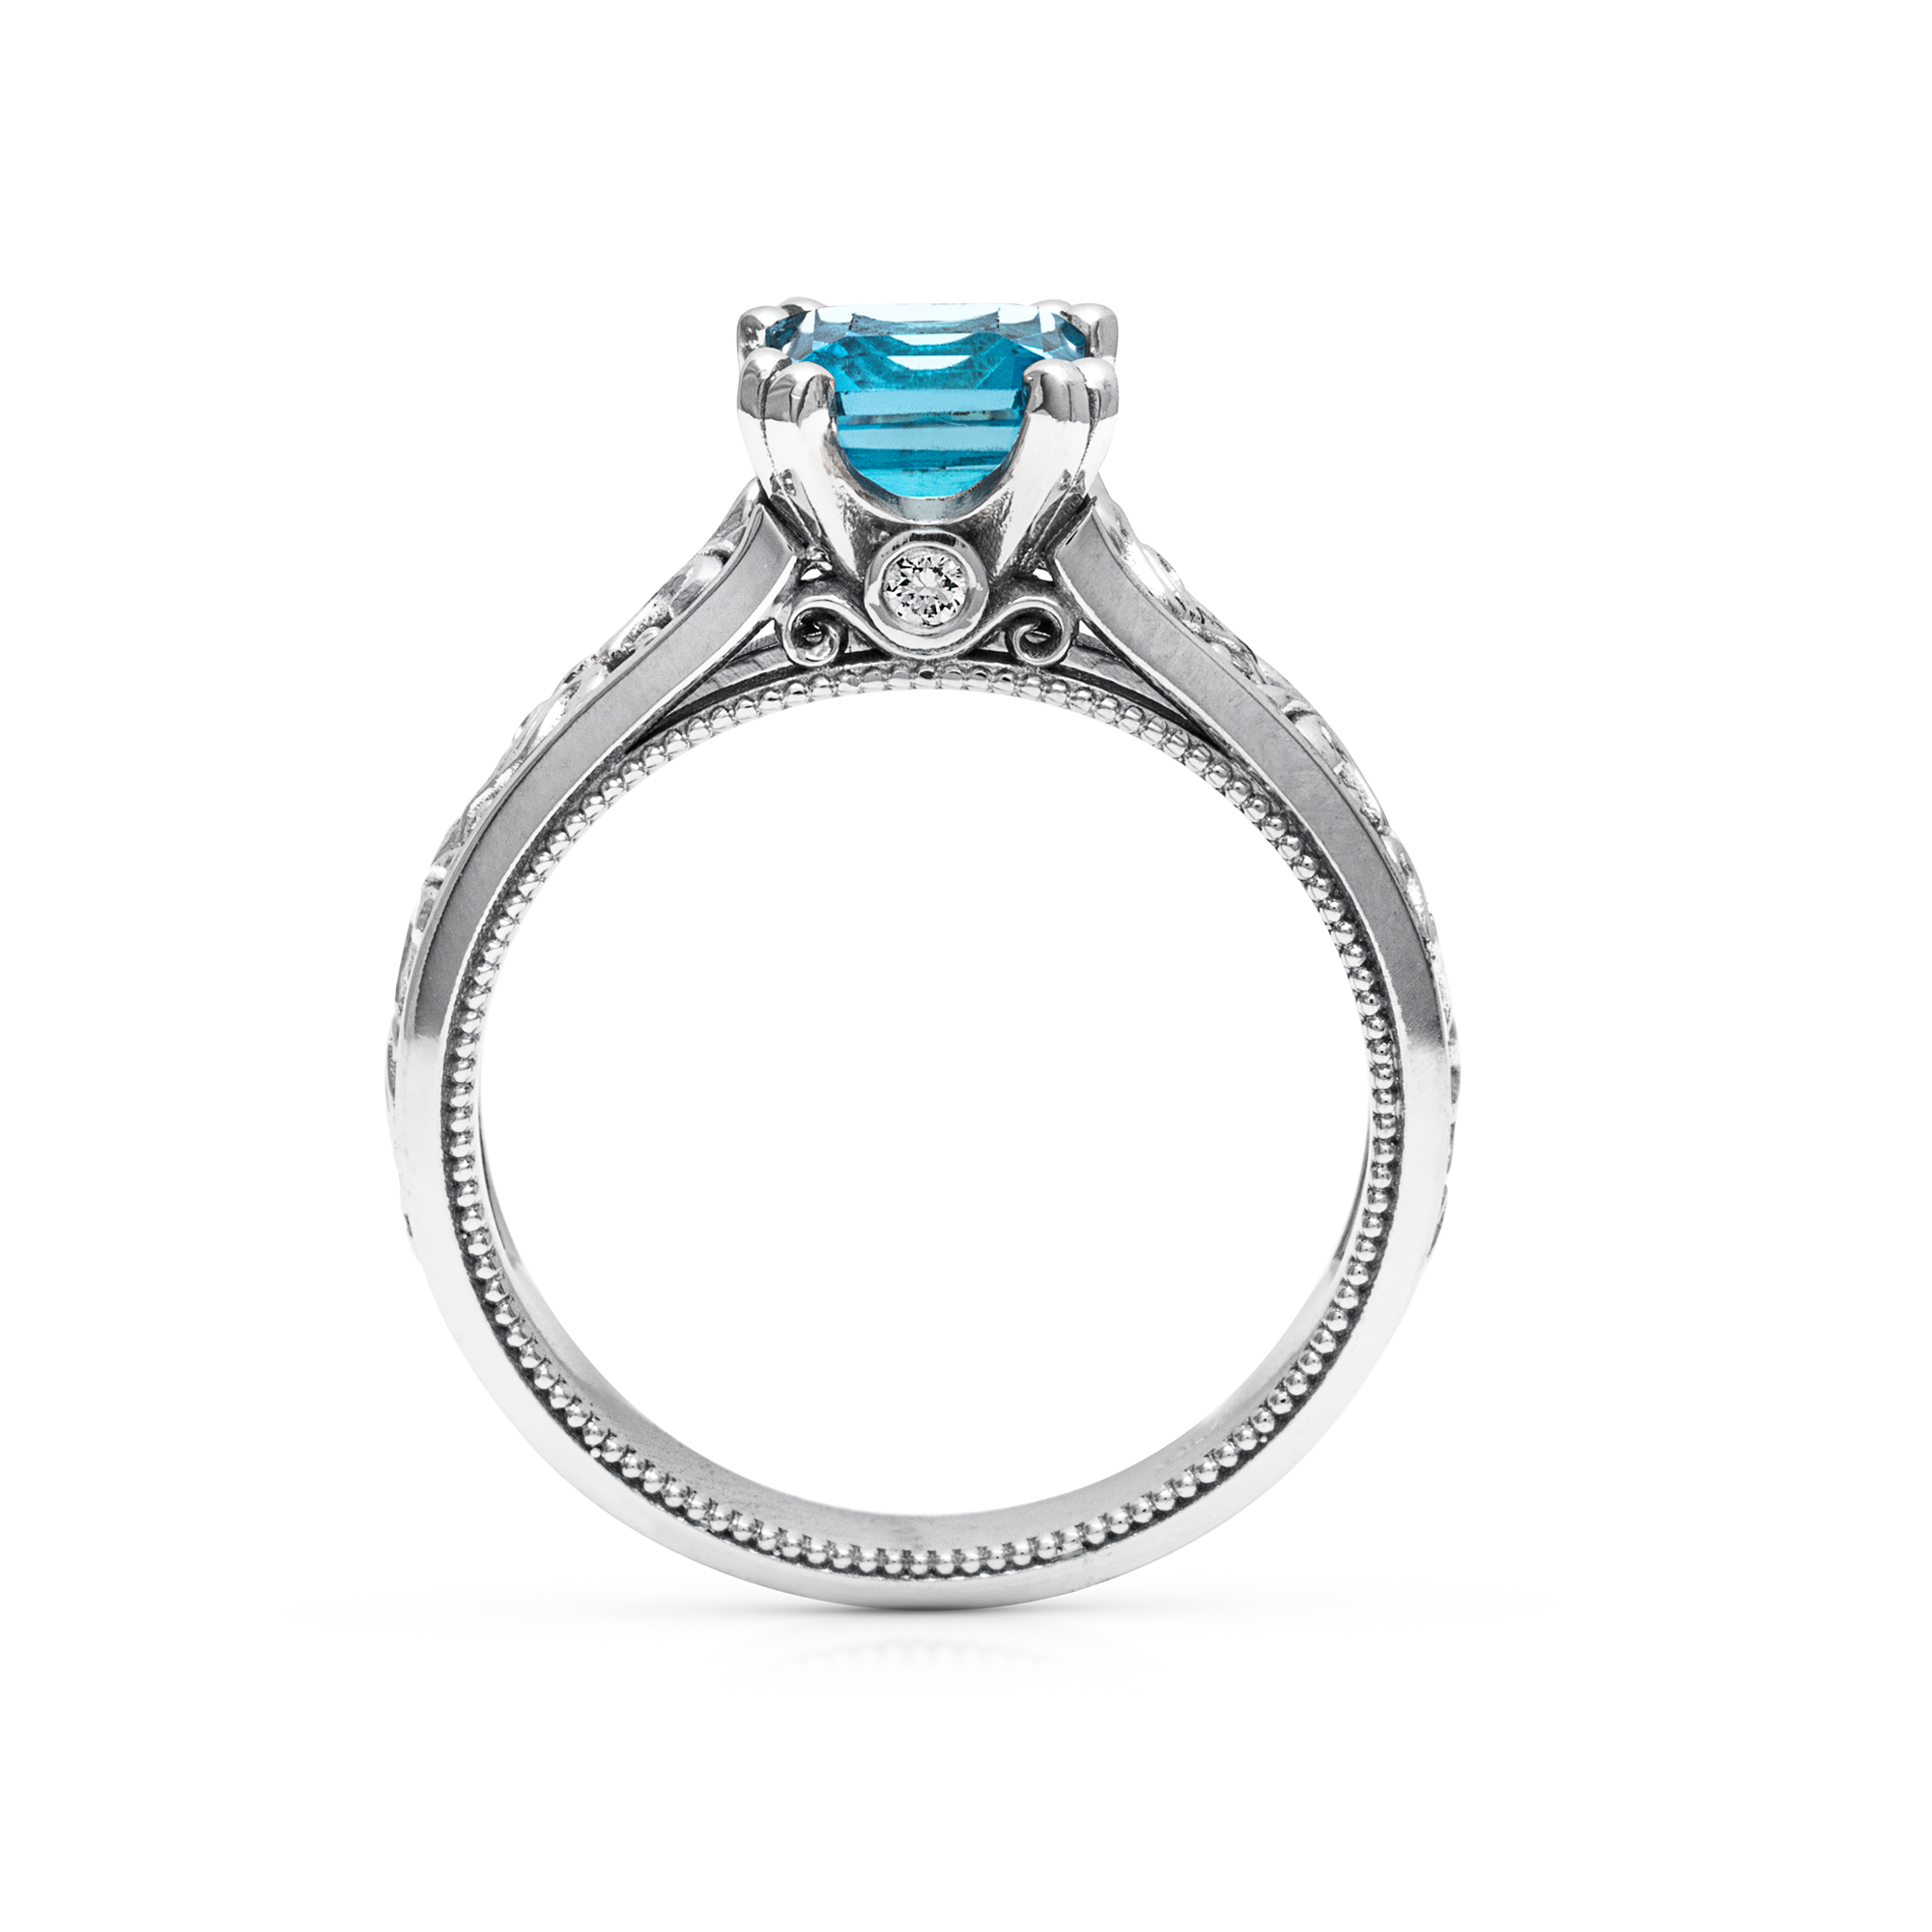 Princess Cut Blue Topaz Ring in 14K White Gold Unique Topaz Ring Princess Cut Engagement Ring Art Deco Ring